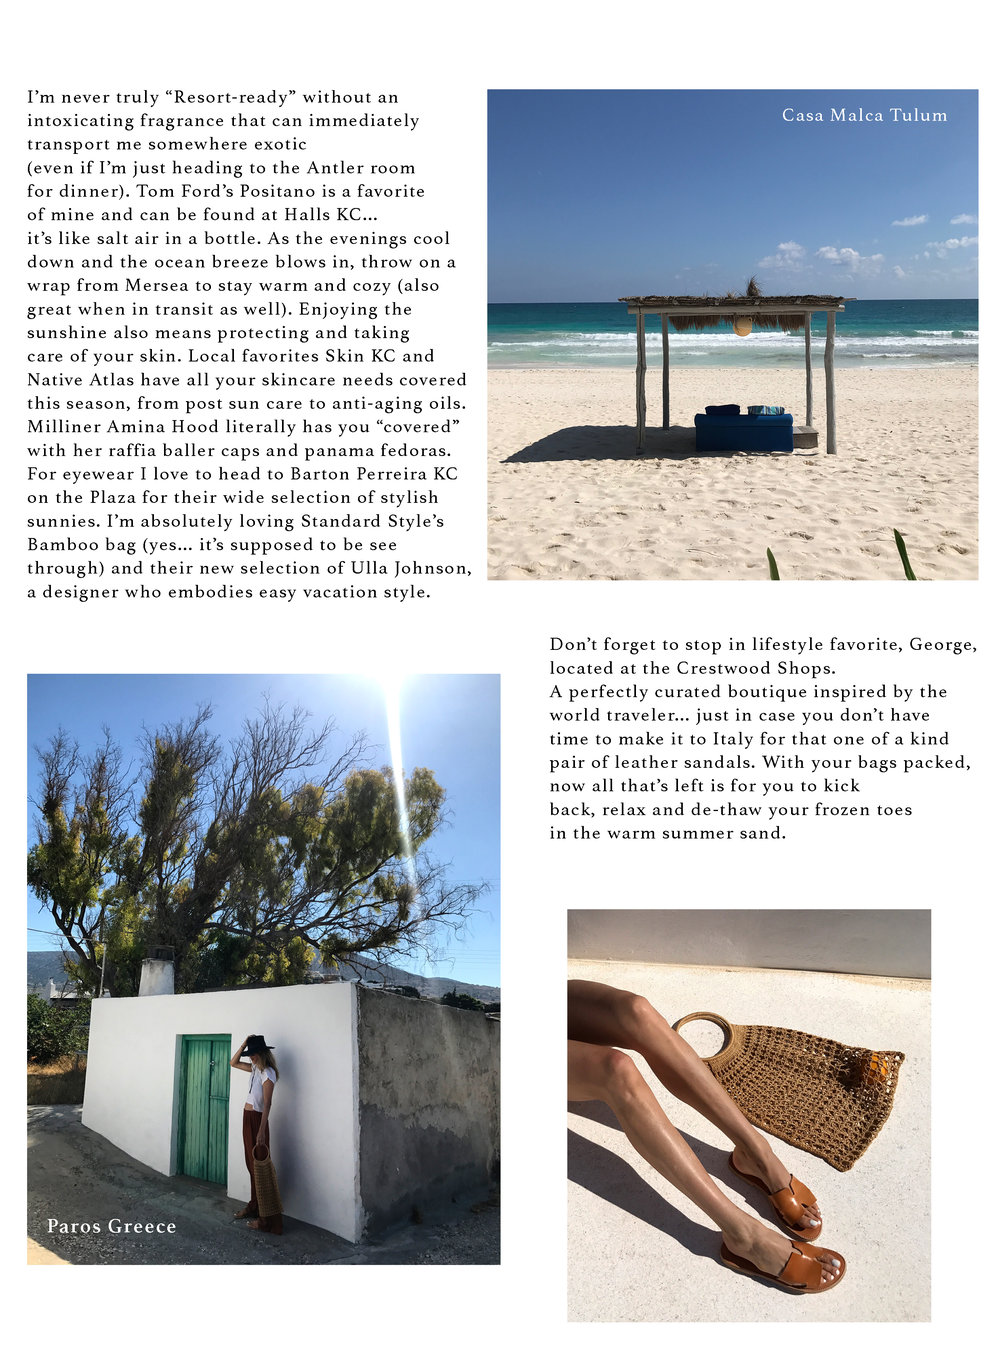 mikc resort page 2.JPG